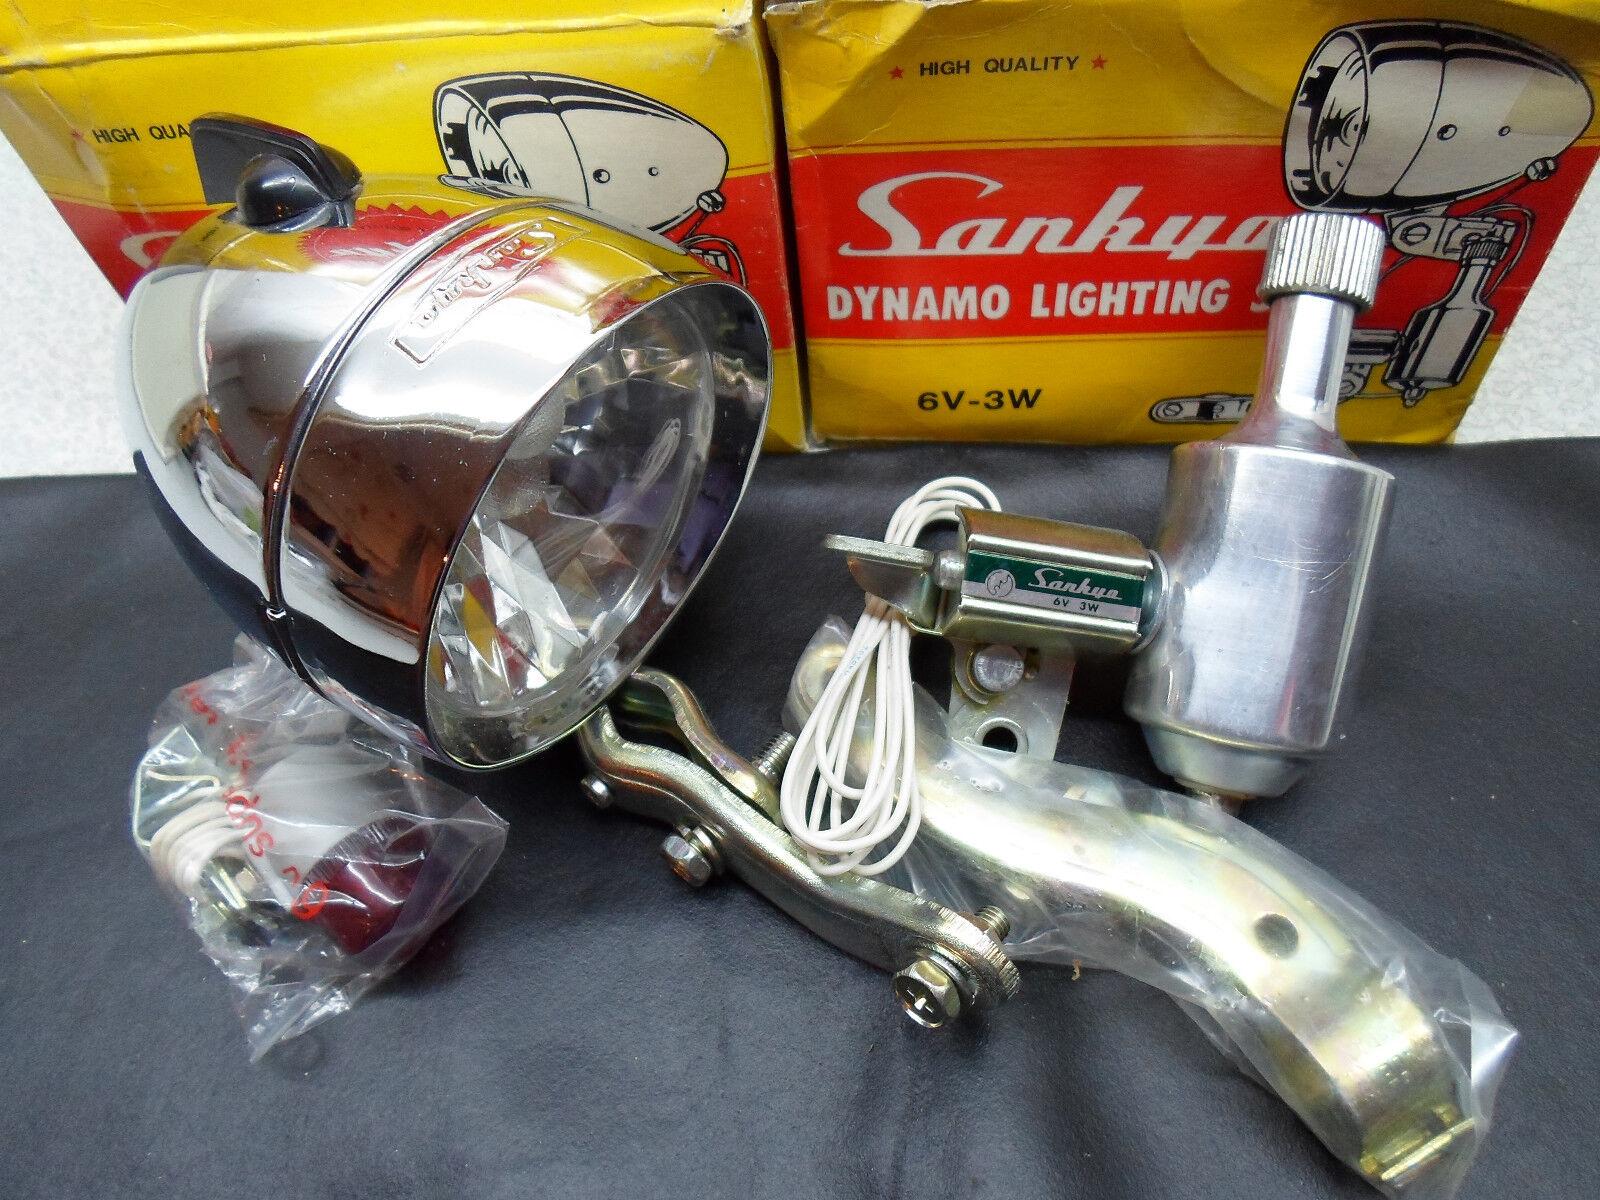 Vintage Bicycle Dynamo Lighting set SANKYO 6V-3W made in Japan N.O.S  1970